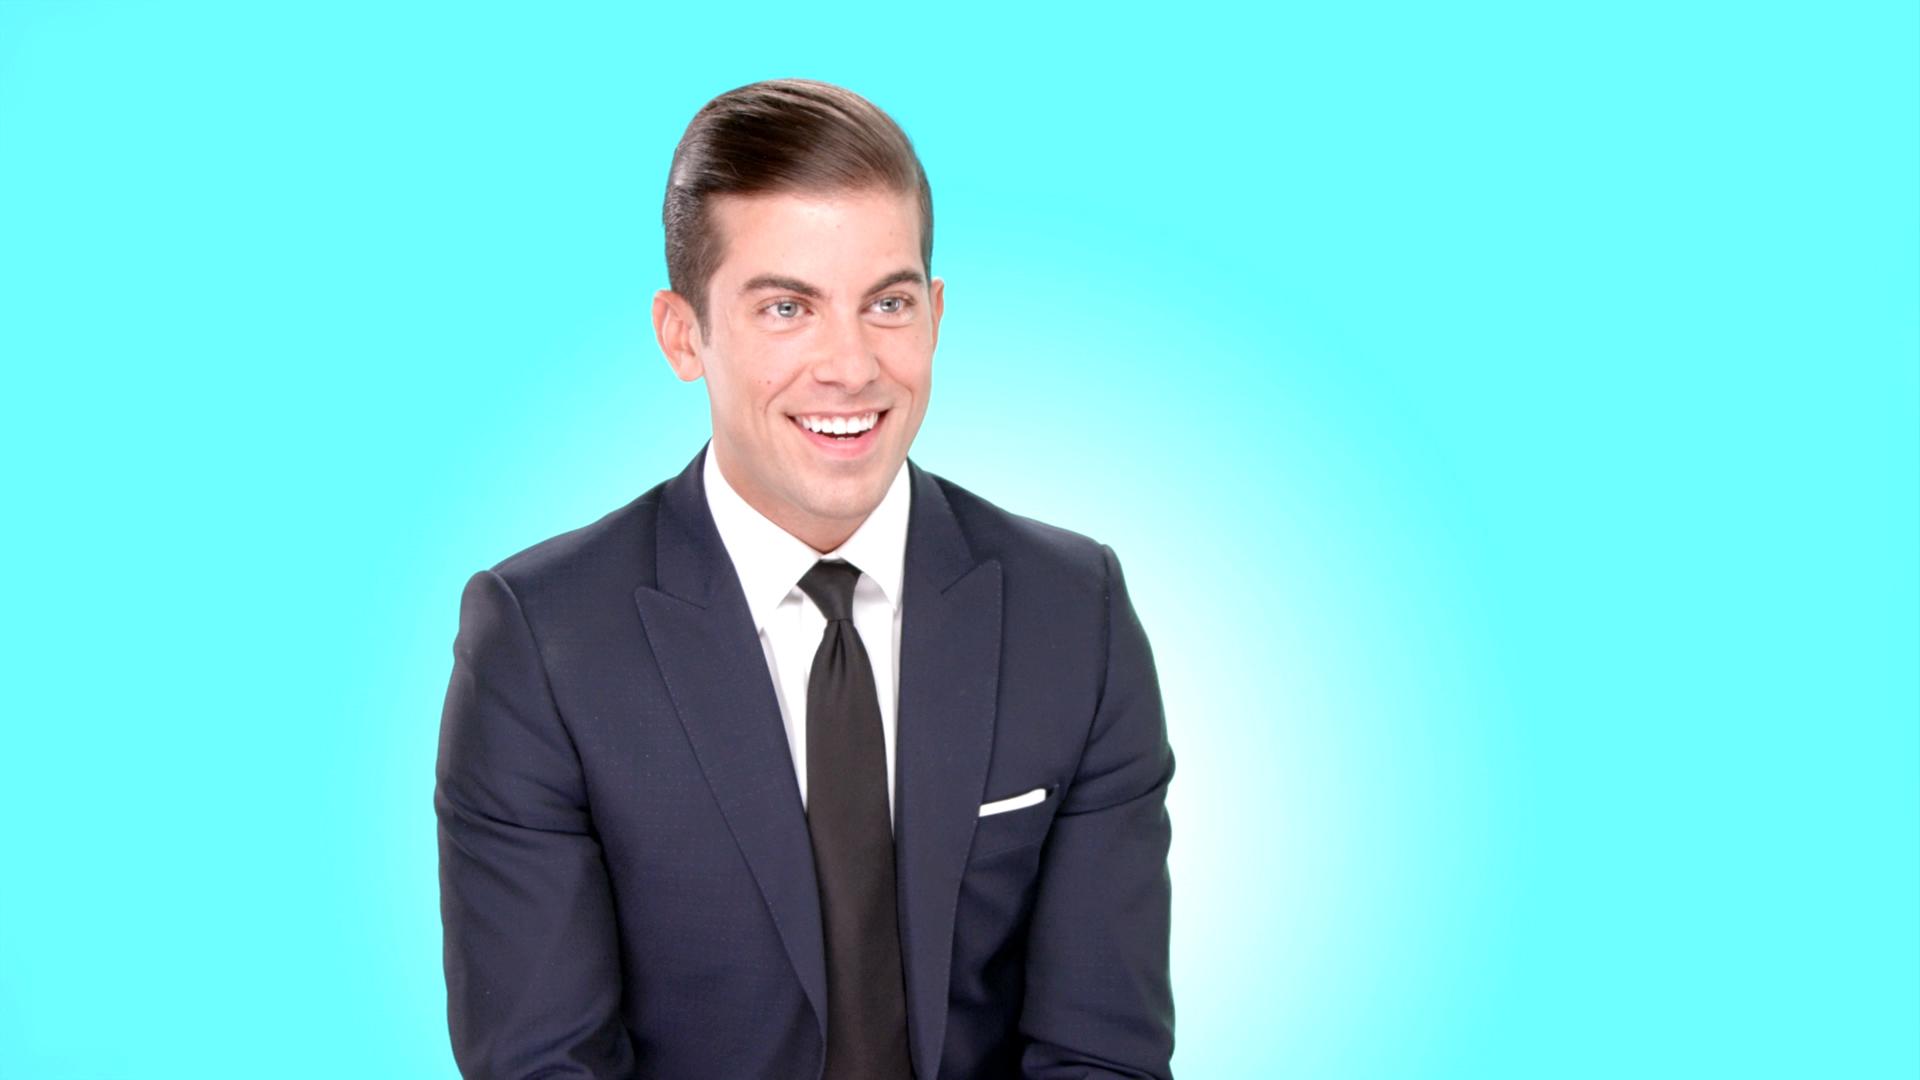 Suits bravo online dating